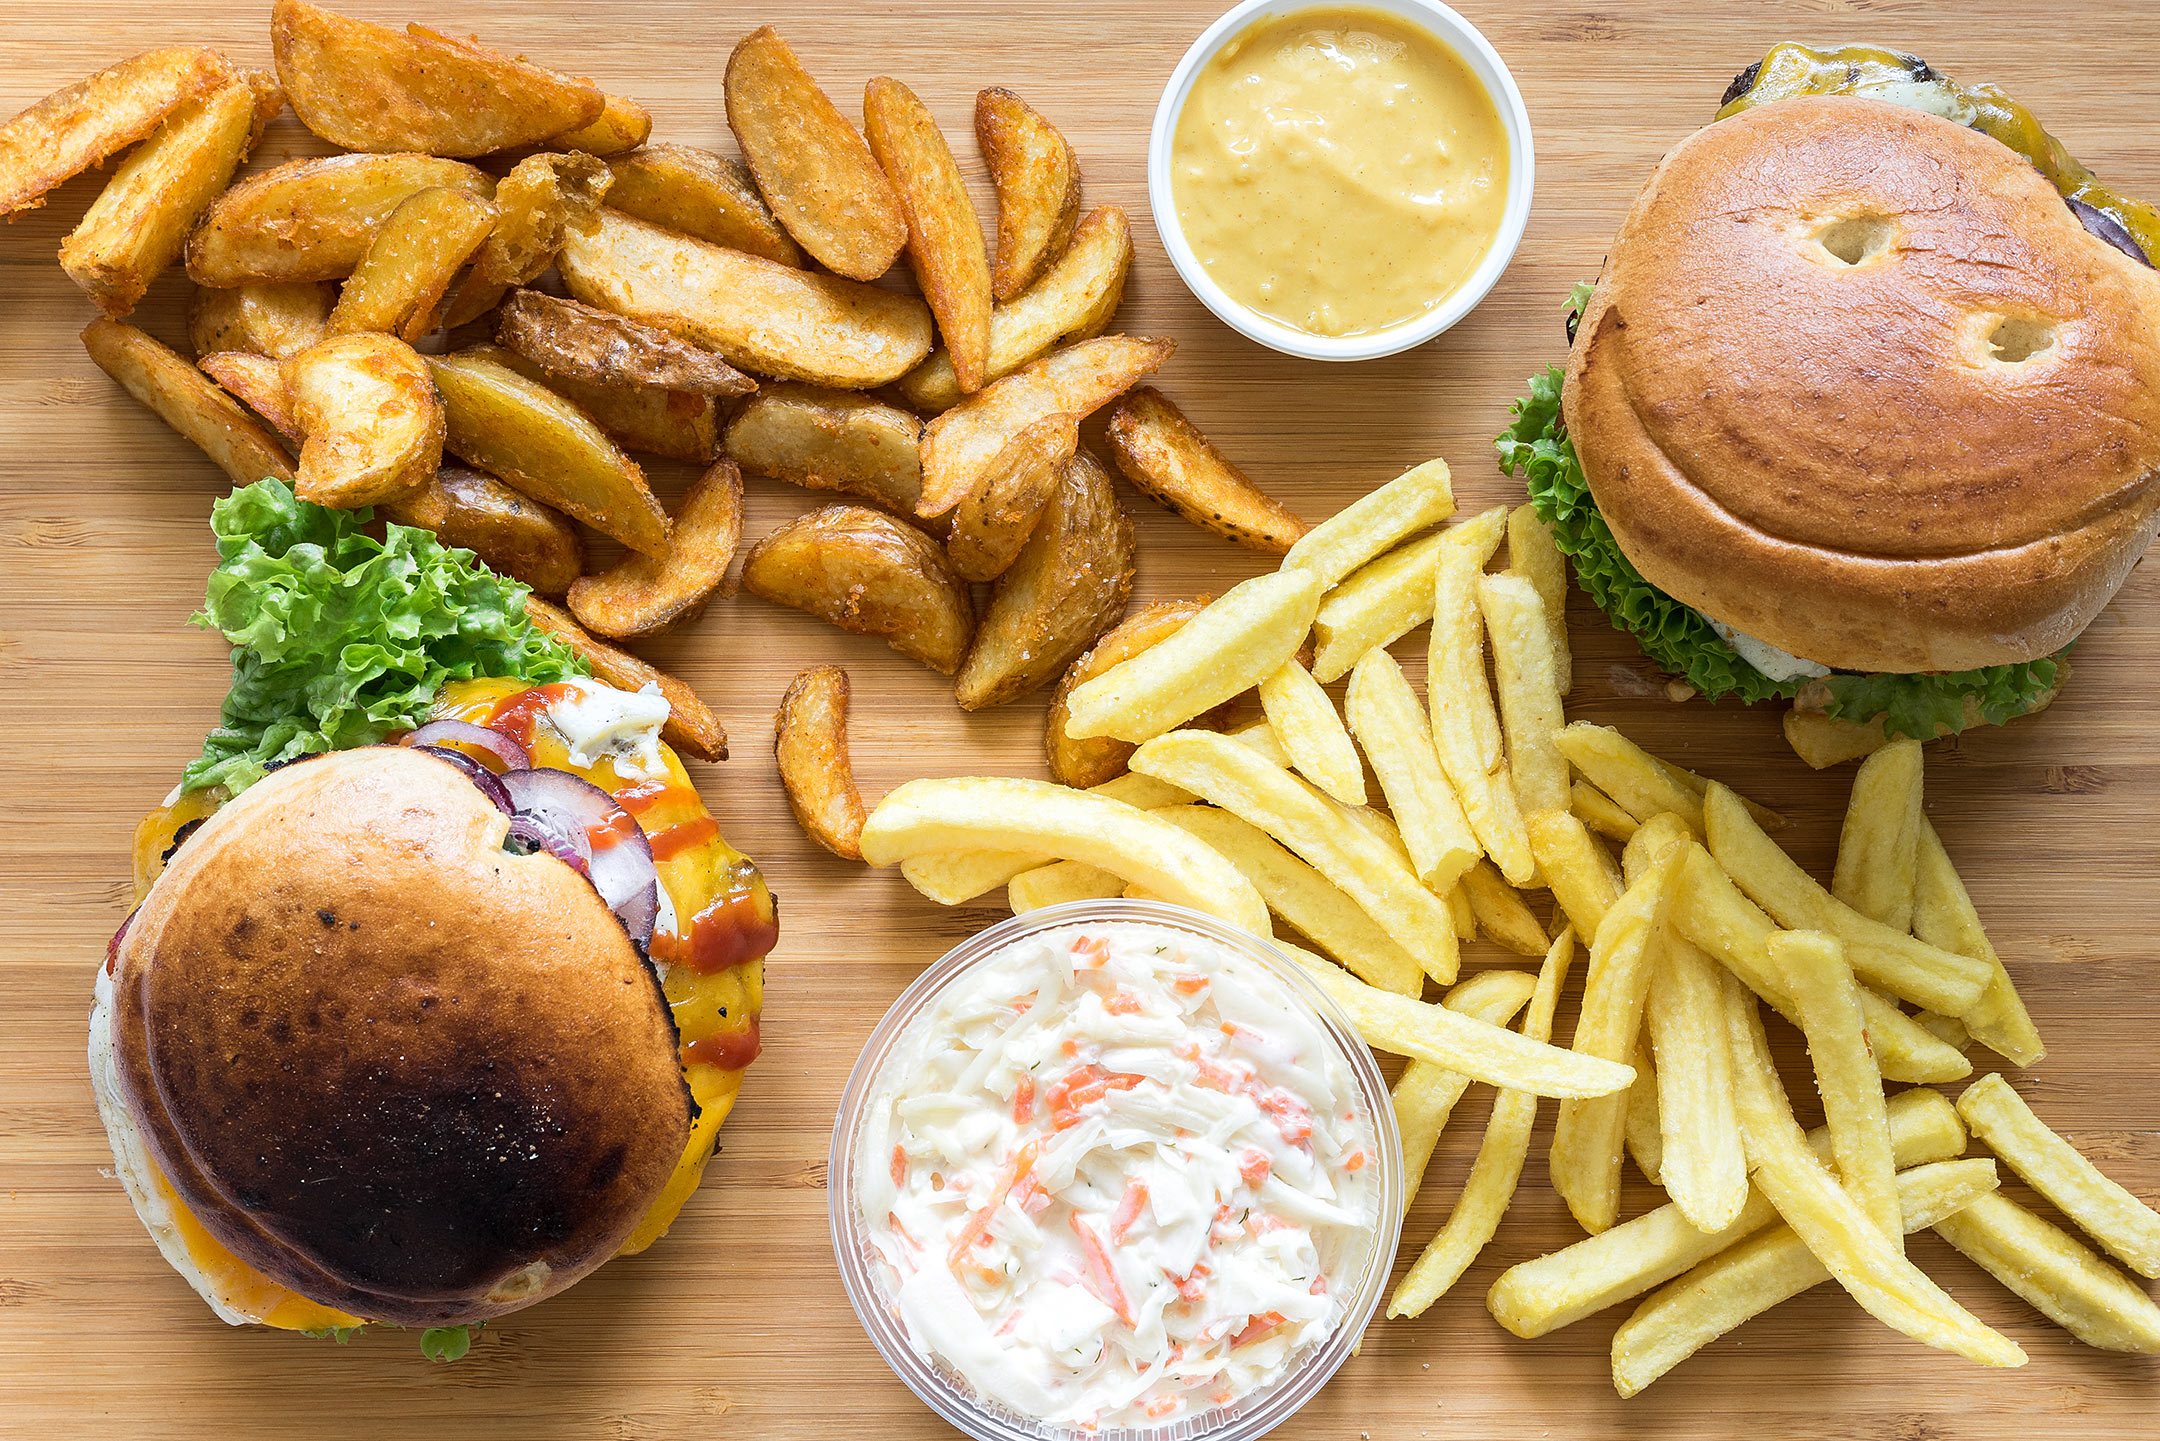 Feuersteins Premium Burger Düesseldorf Foodora Lifestyle Blog Sunnyinga